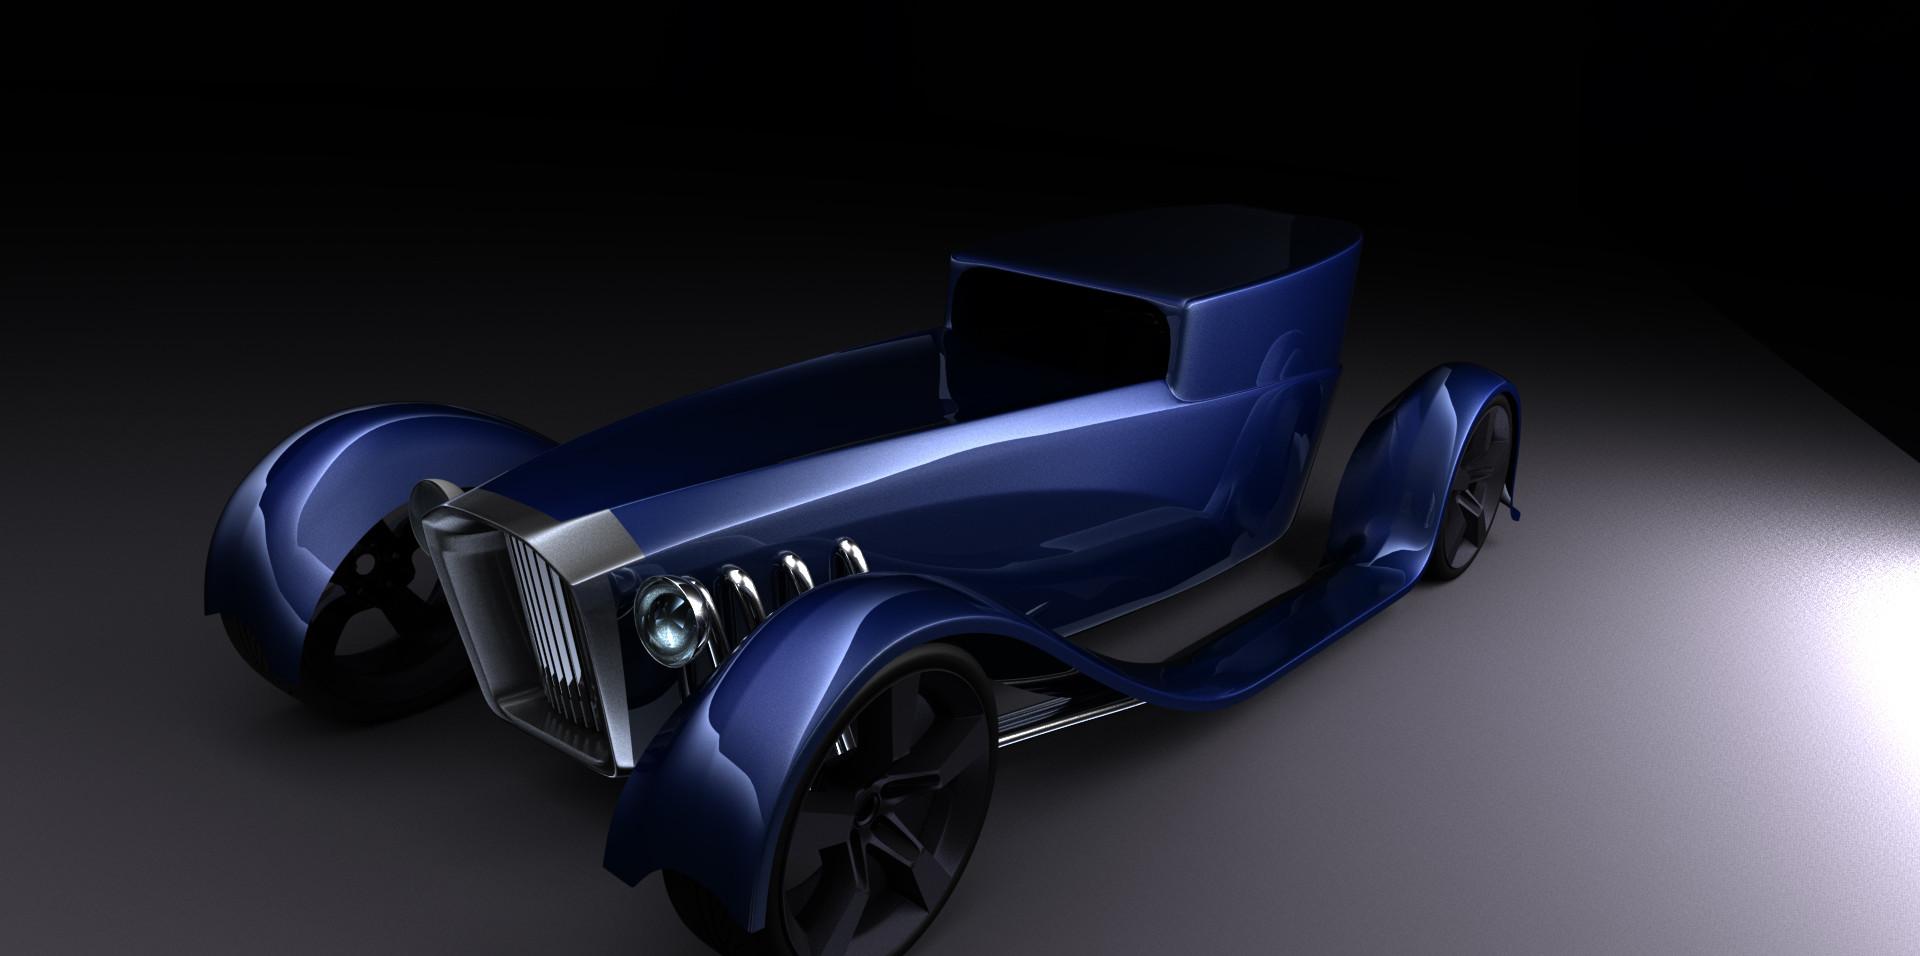 Roadster_Test---2K---009.jpg